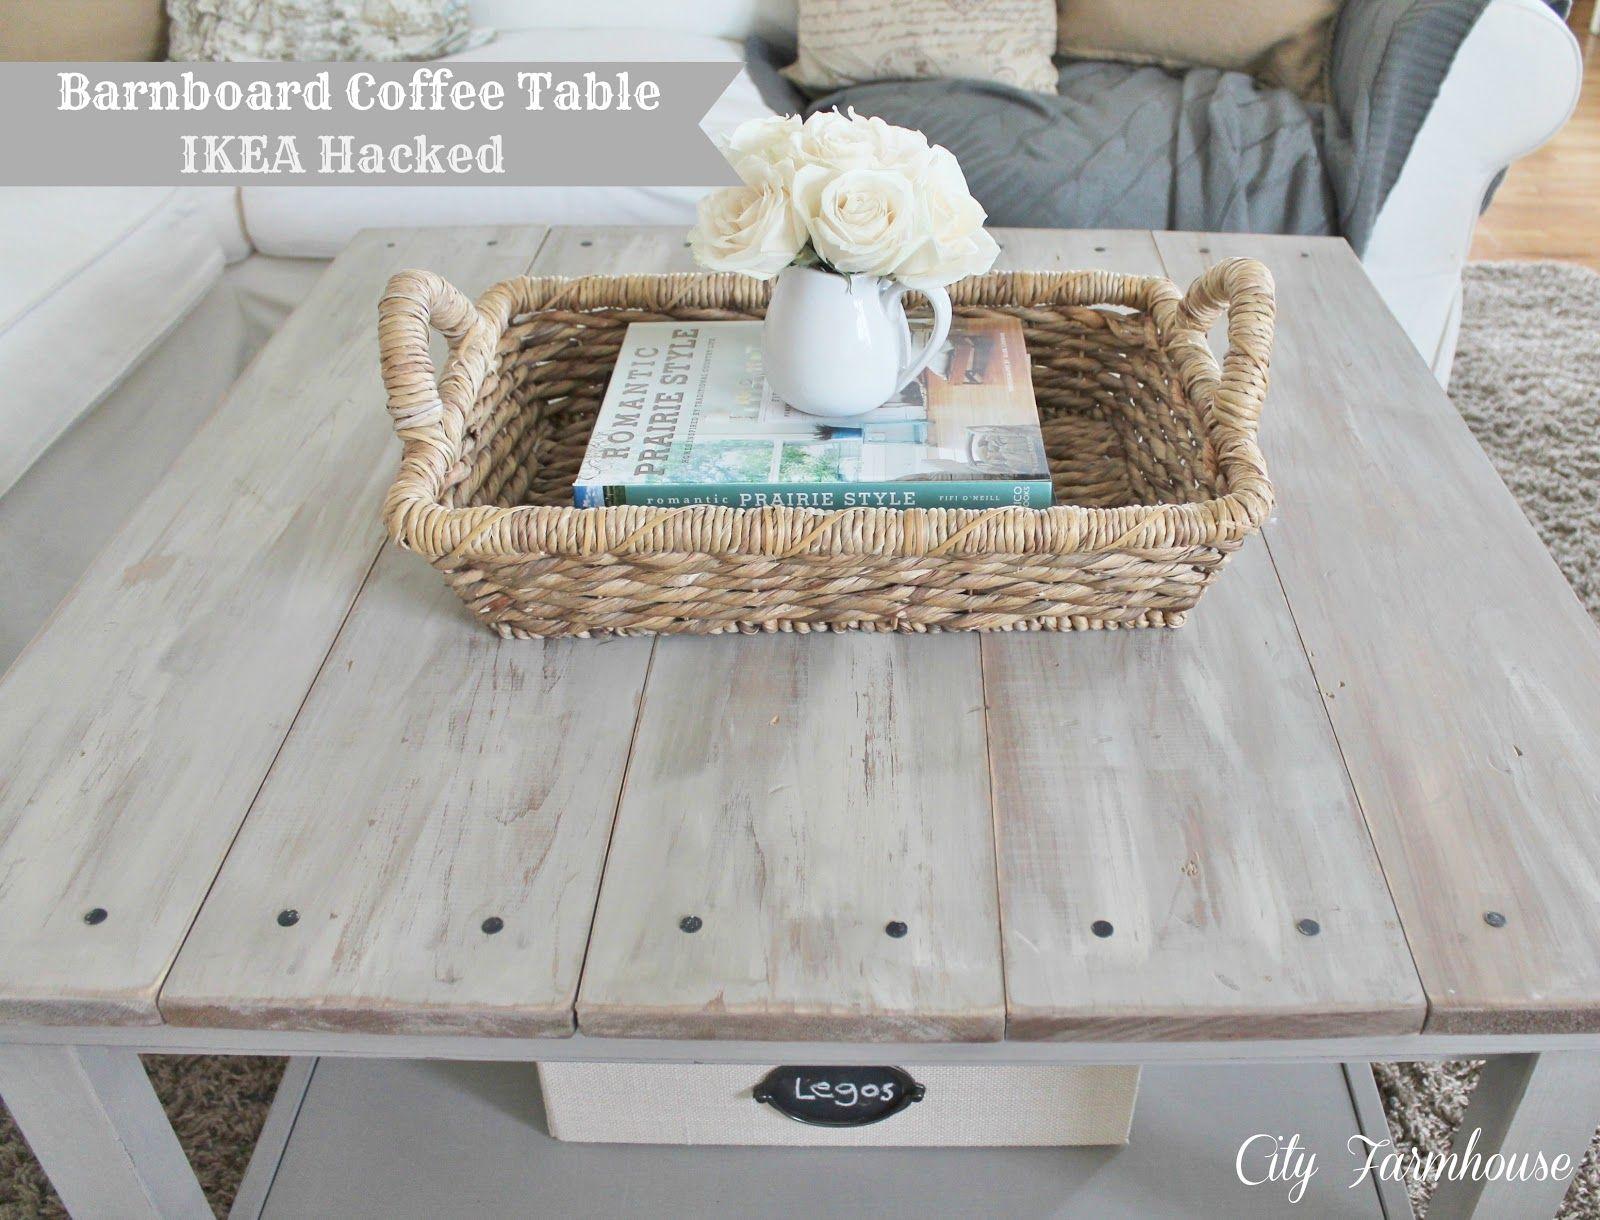 City Farmhouse Ikea Hacked Barnboard Coffee Table Tutorial Ikea Coffee Table Ikea Hack Furniture Makeover [ 1220 x 1600 Pixel ]